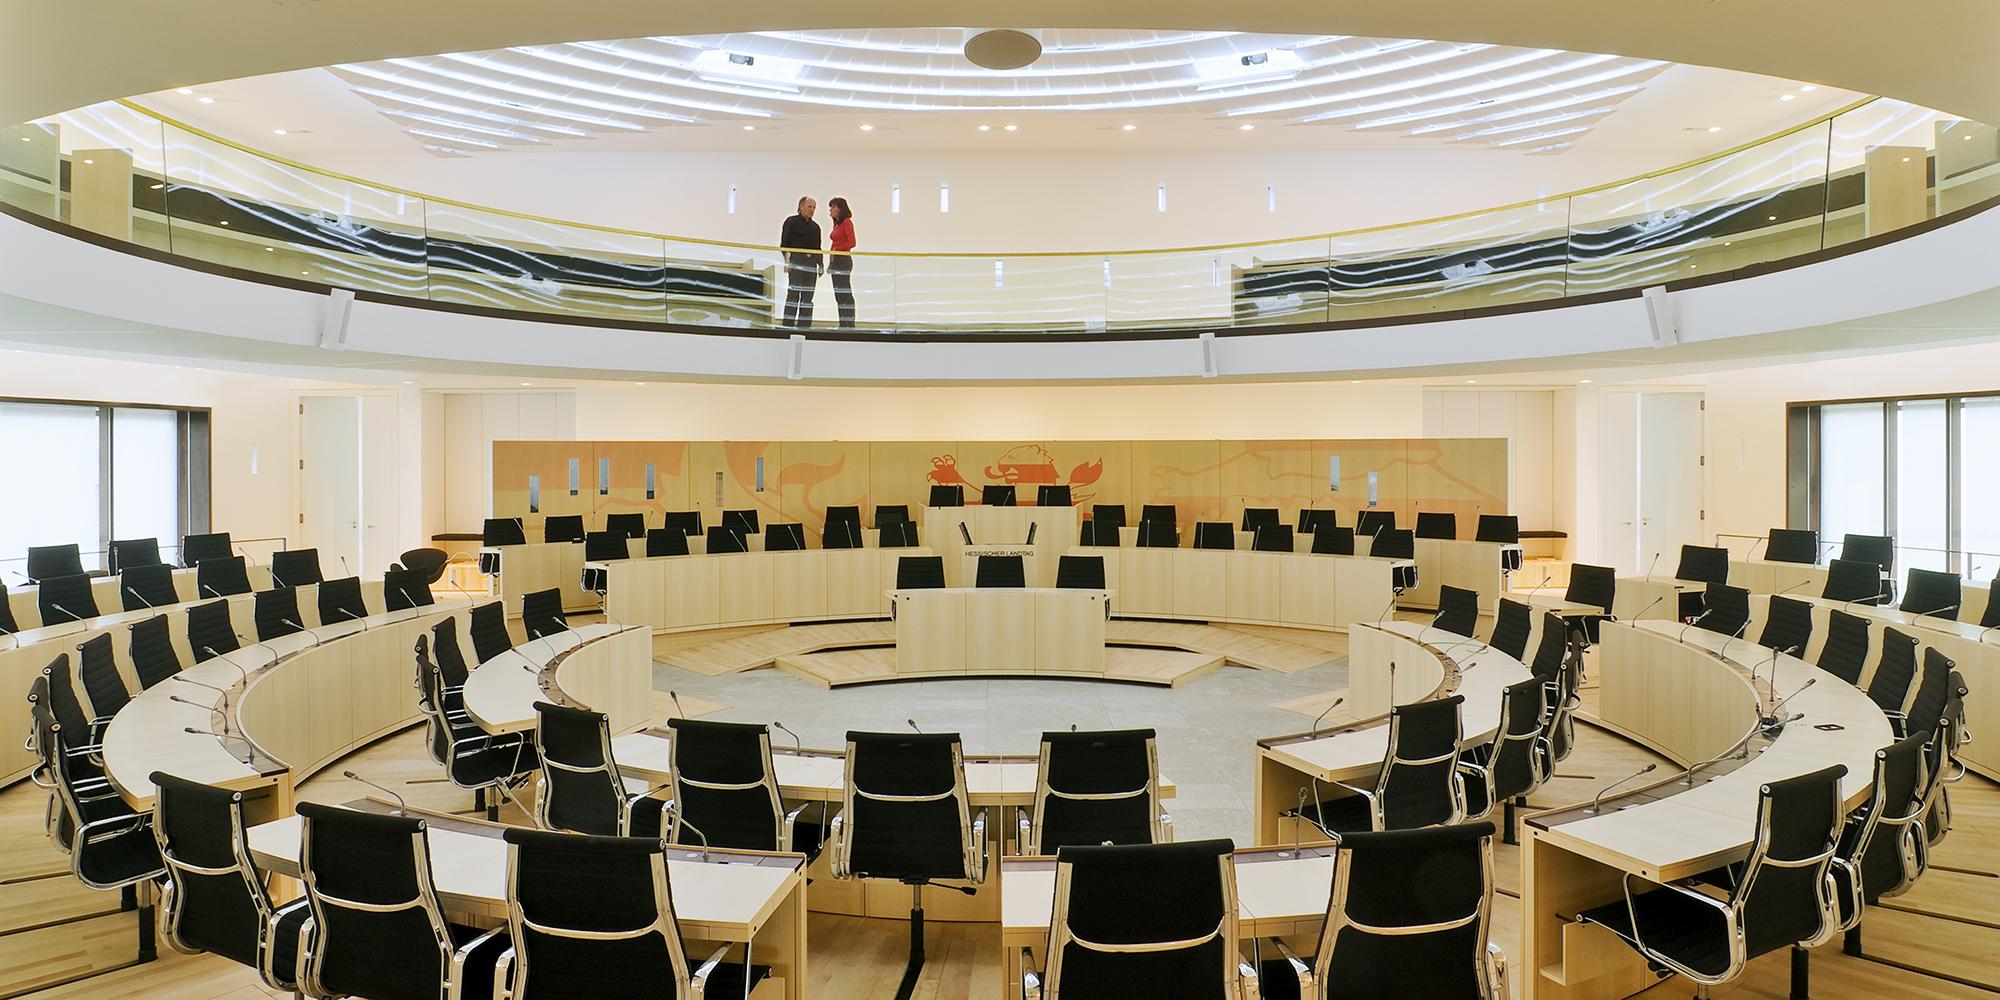 Plenarsaalgebäude Hessischer Landtag Innenansicht Plenarsaal